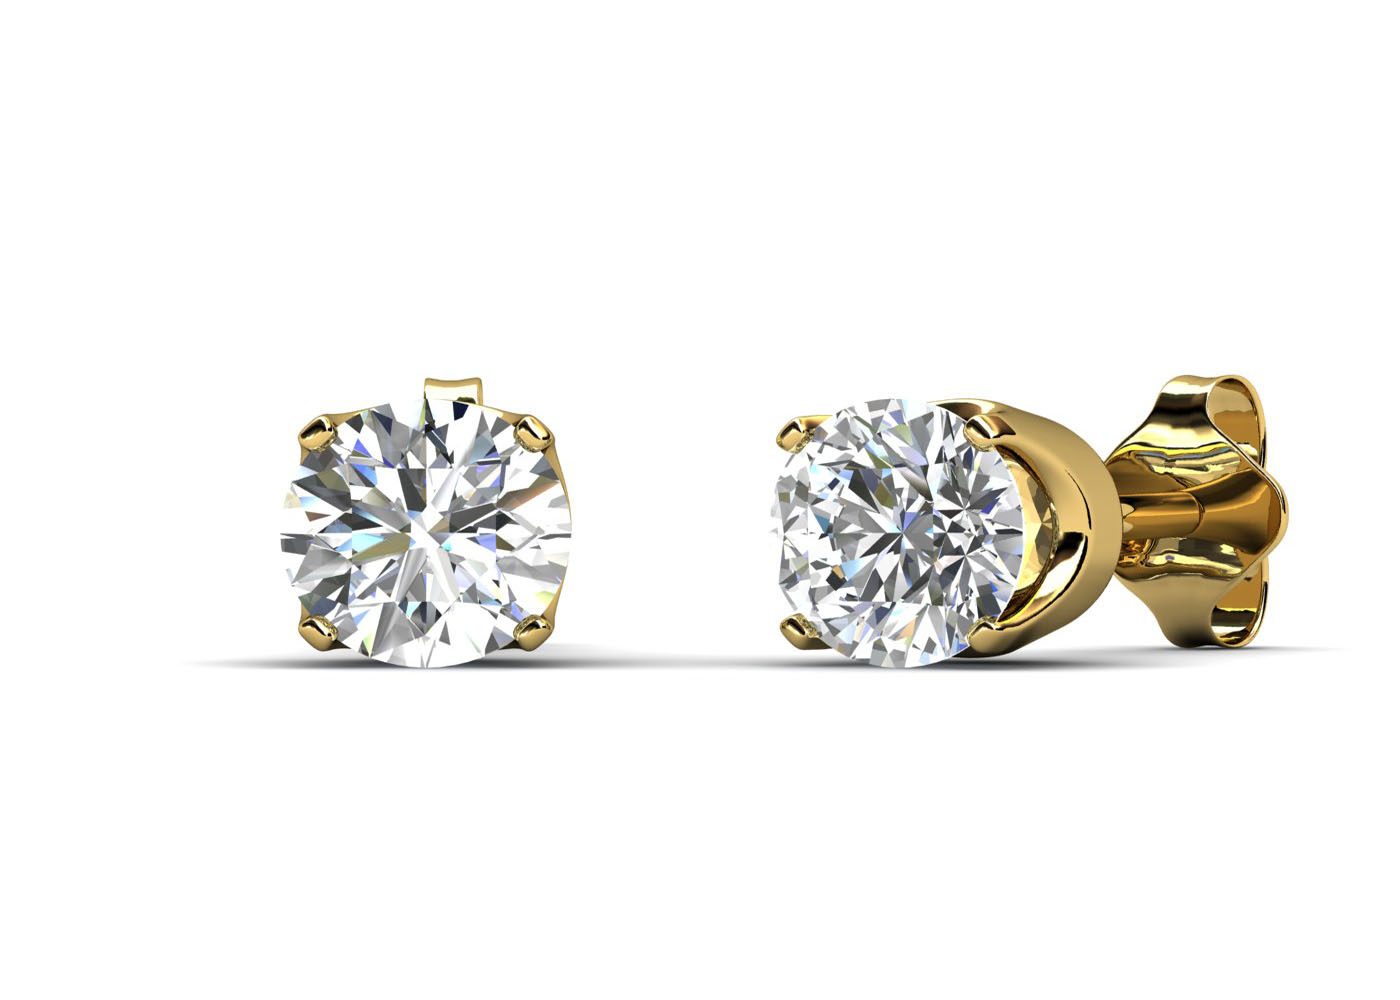 Lot 43 - 9ct Claw Set Diamond Earrings 0.20 Carats